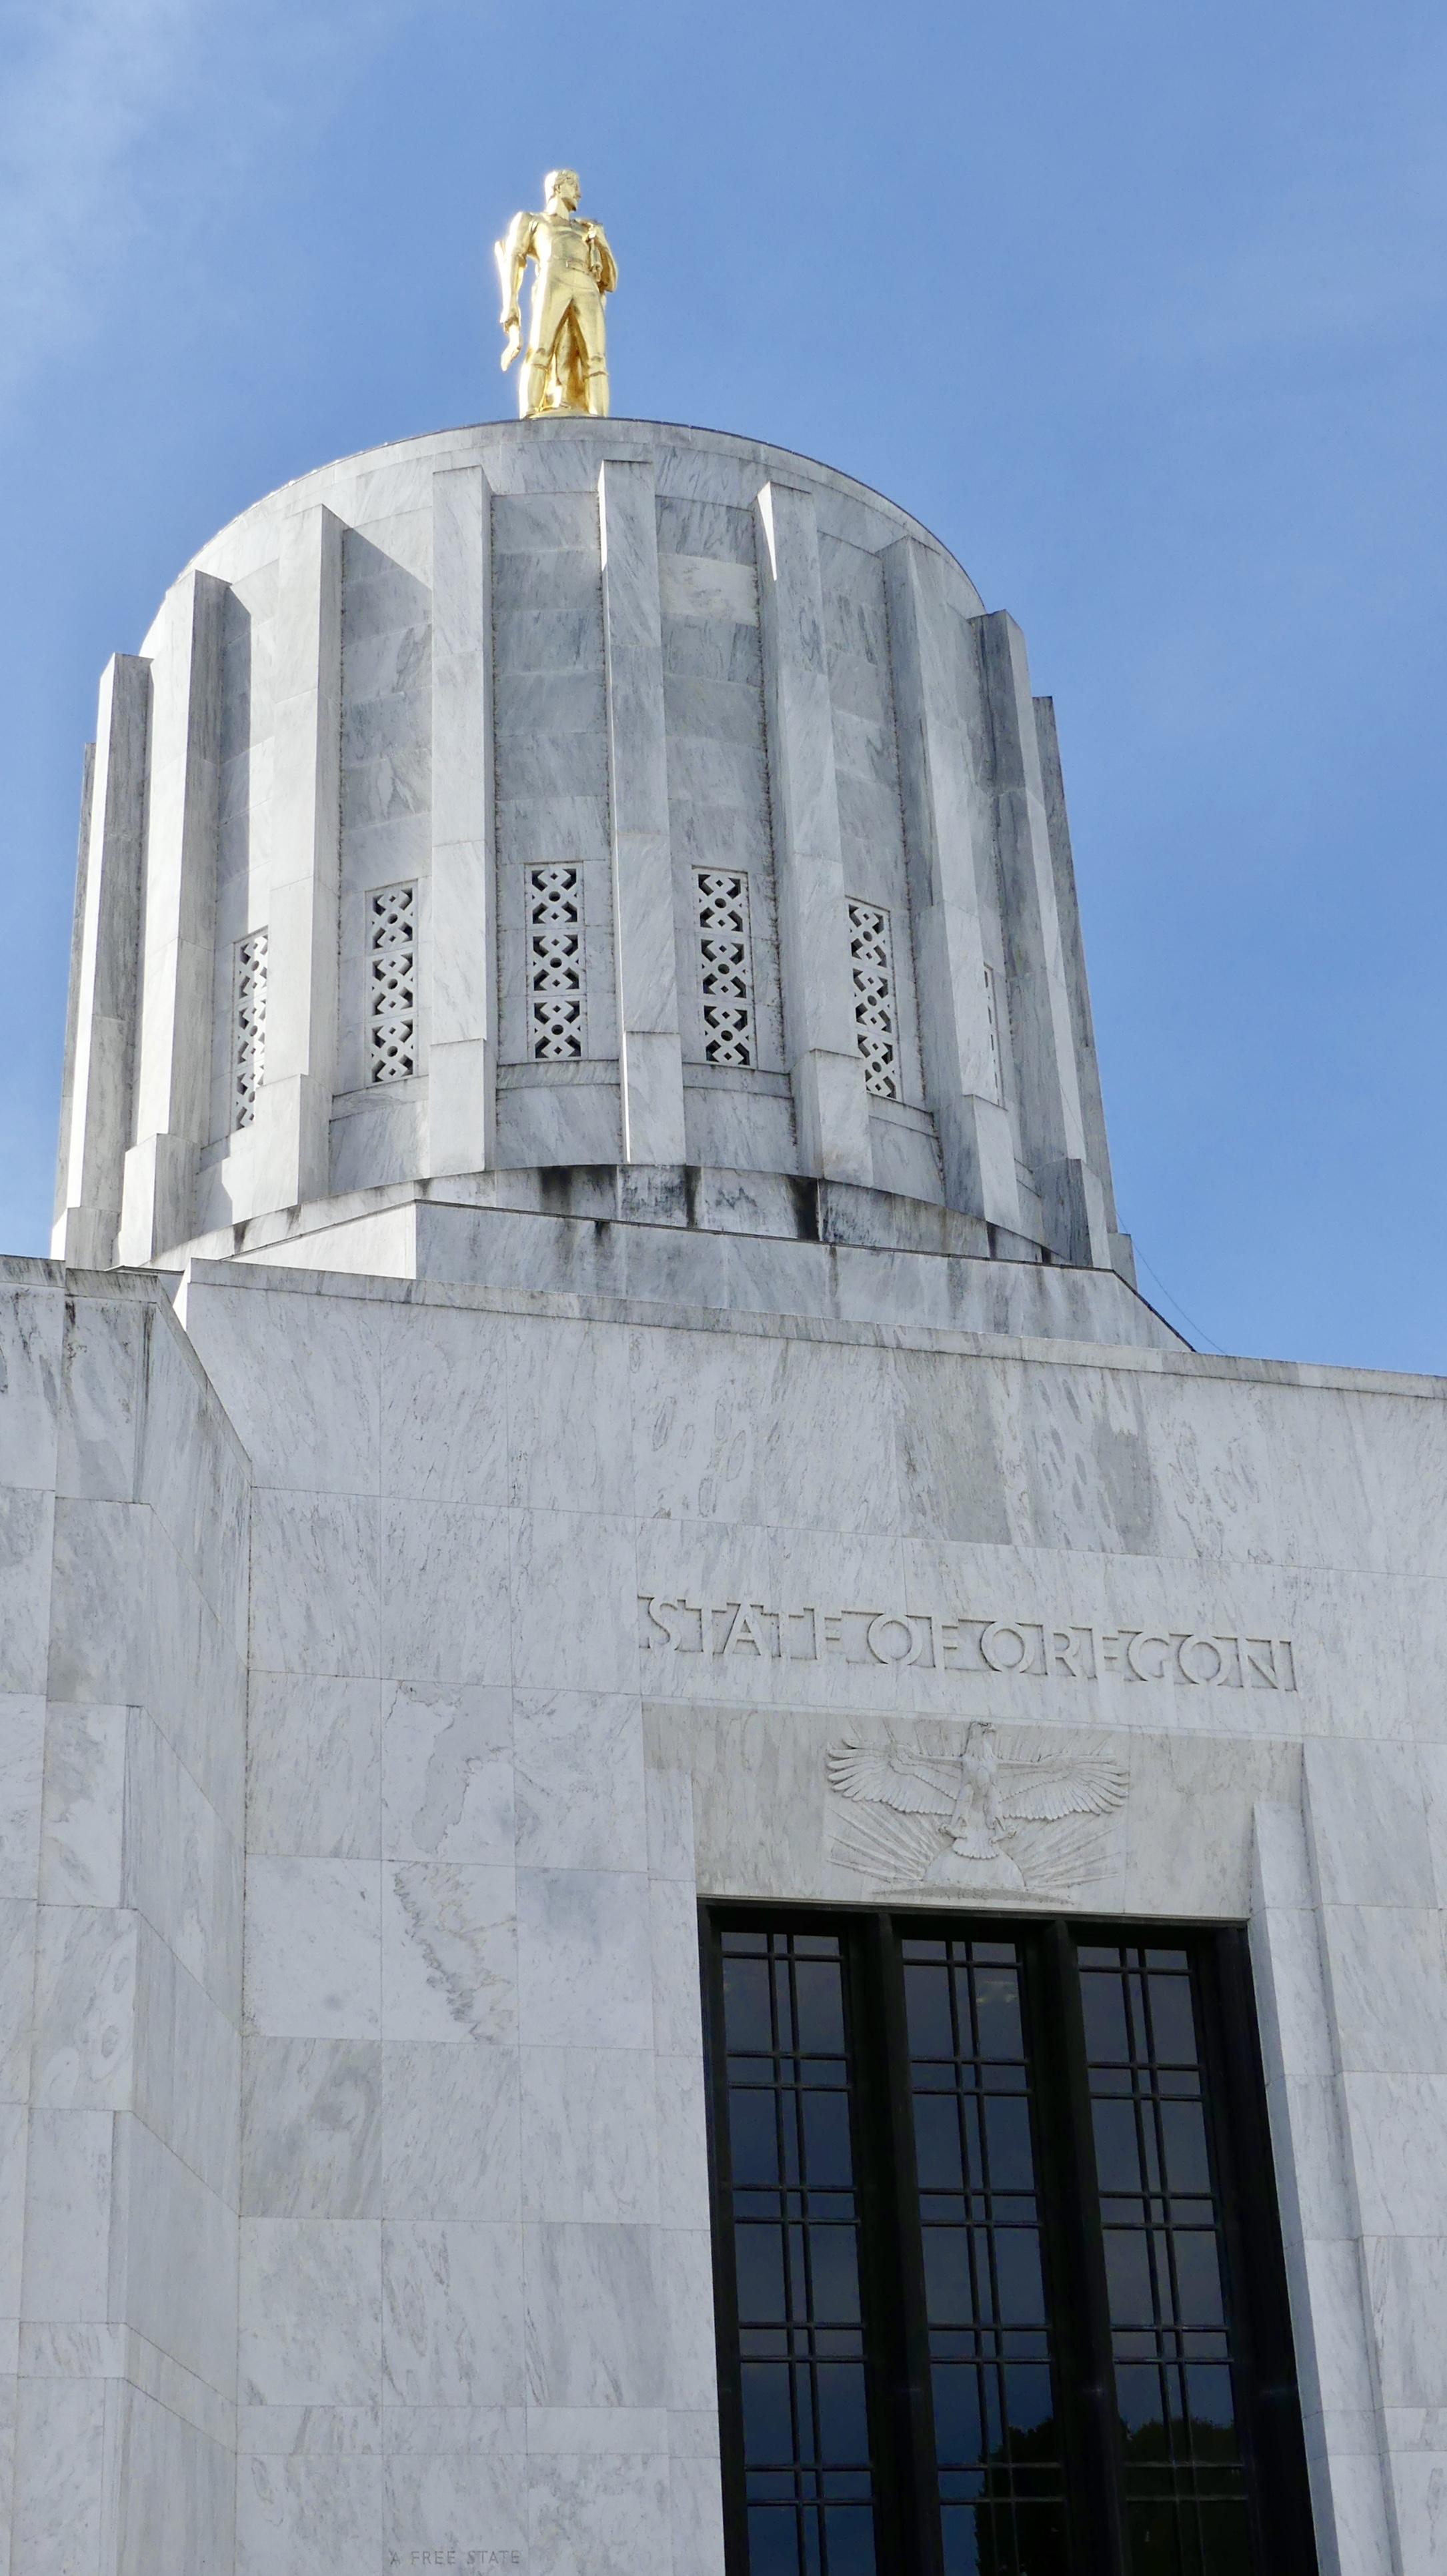 State of Origin… er… Oregon